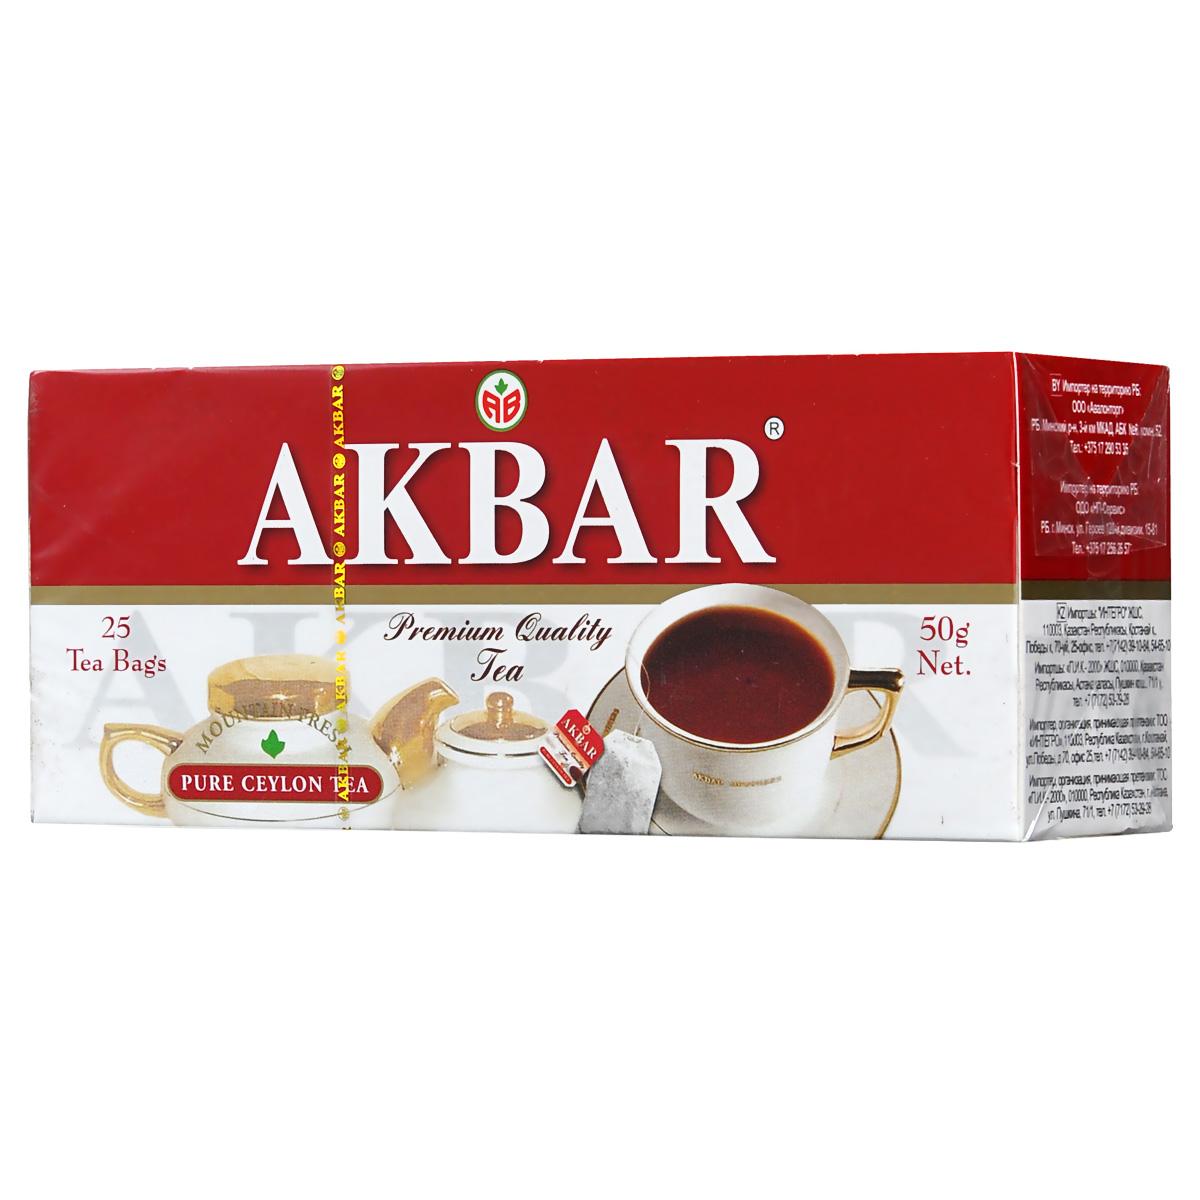 Akbar Mountain Fresh черный чай в пакетиках, 25 шт